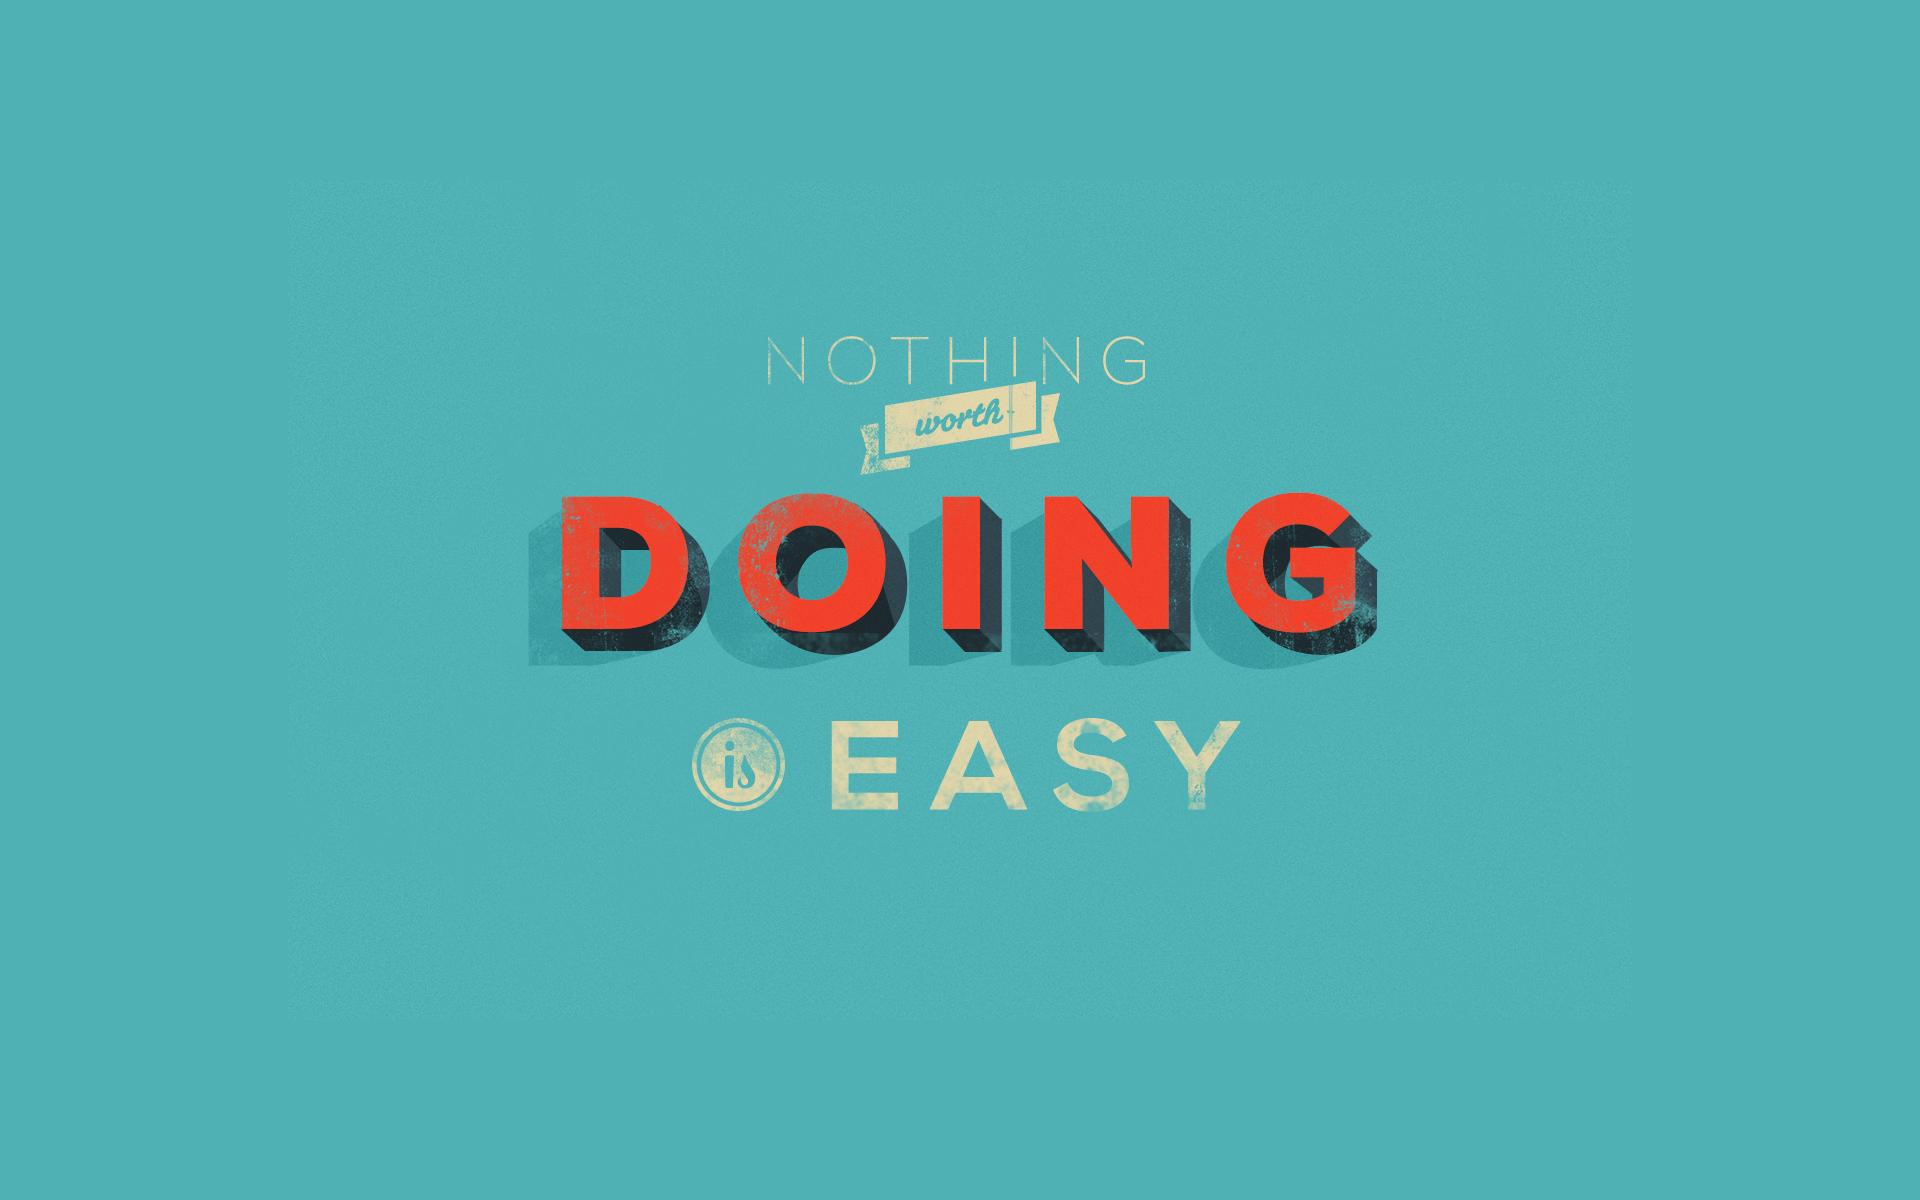 Nothing worth doing big